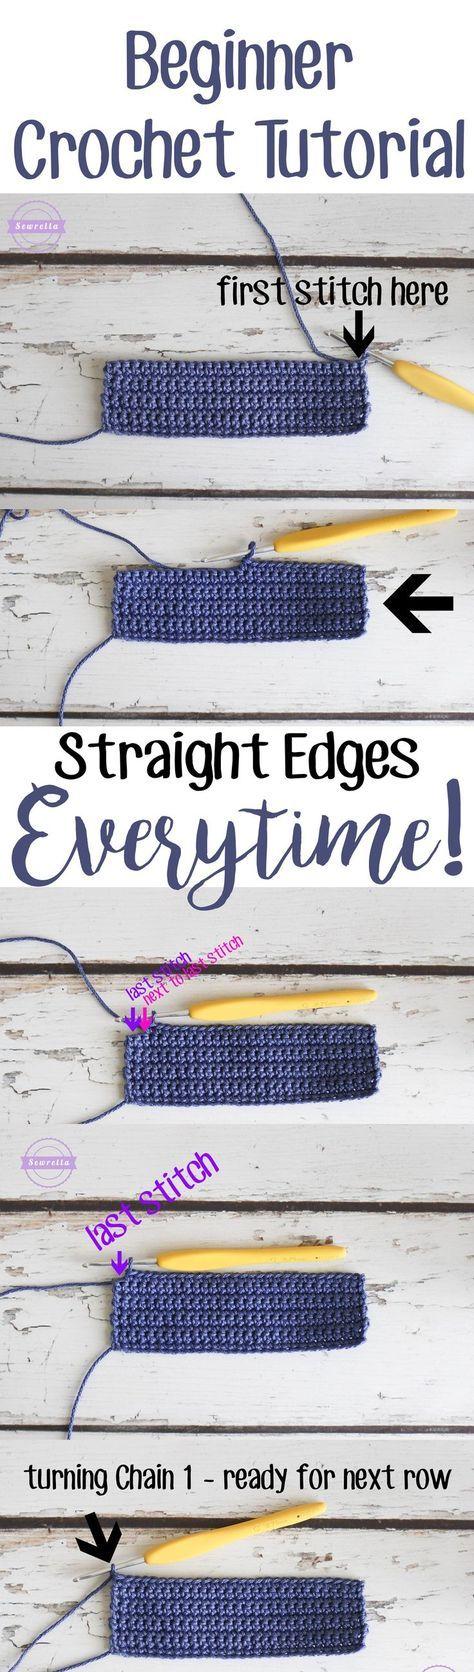 Crochet Tips - Straight Edges Everytime • Sewrella